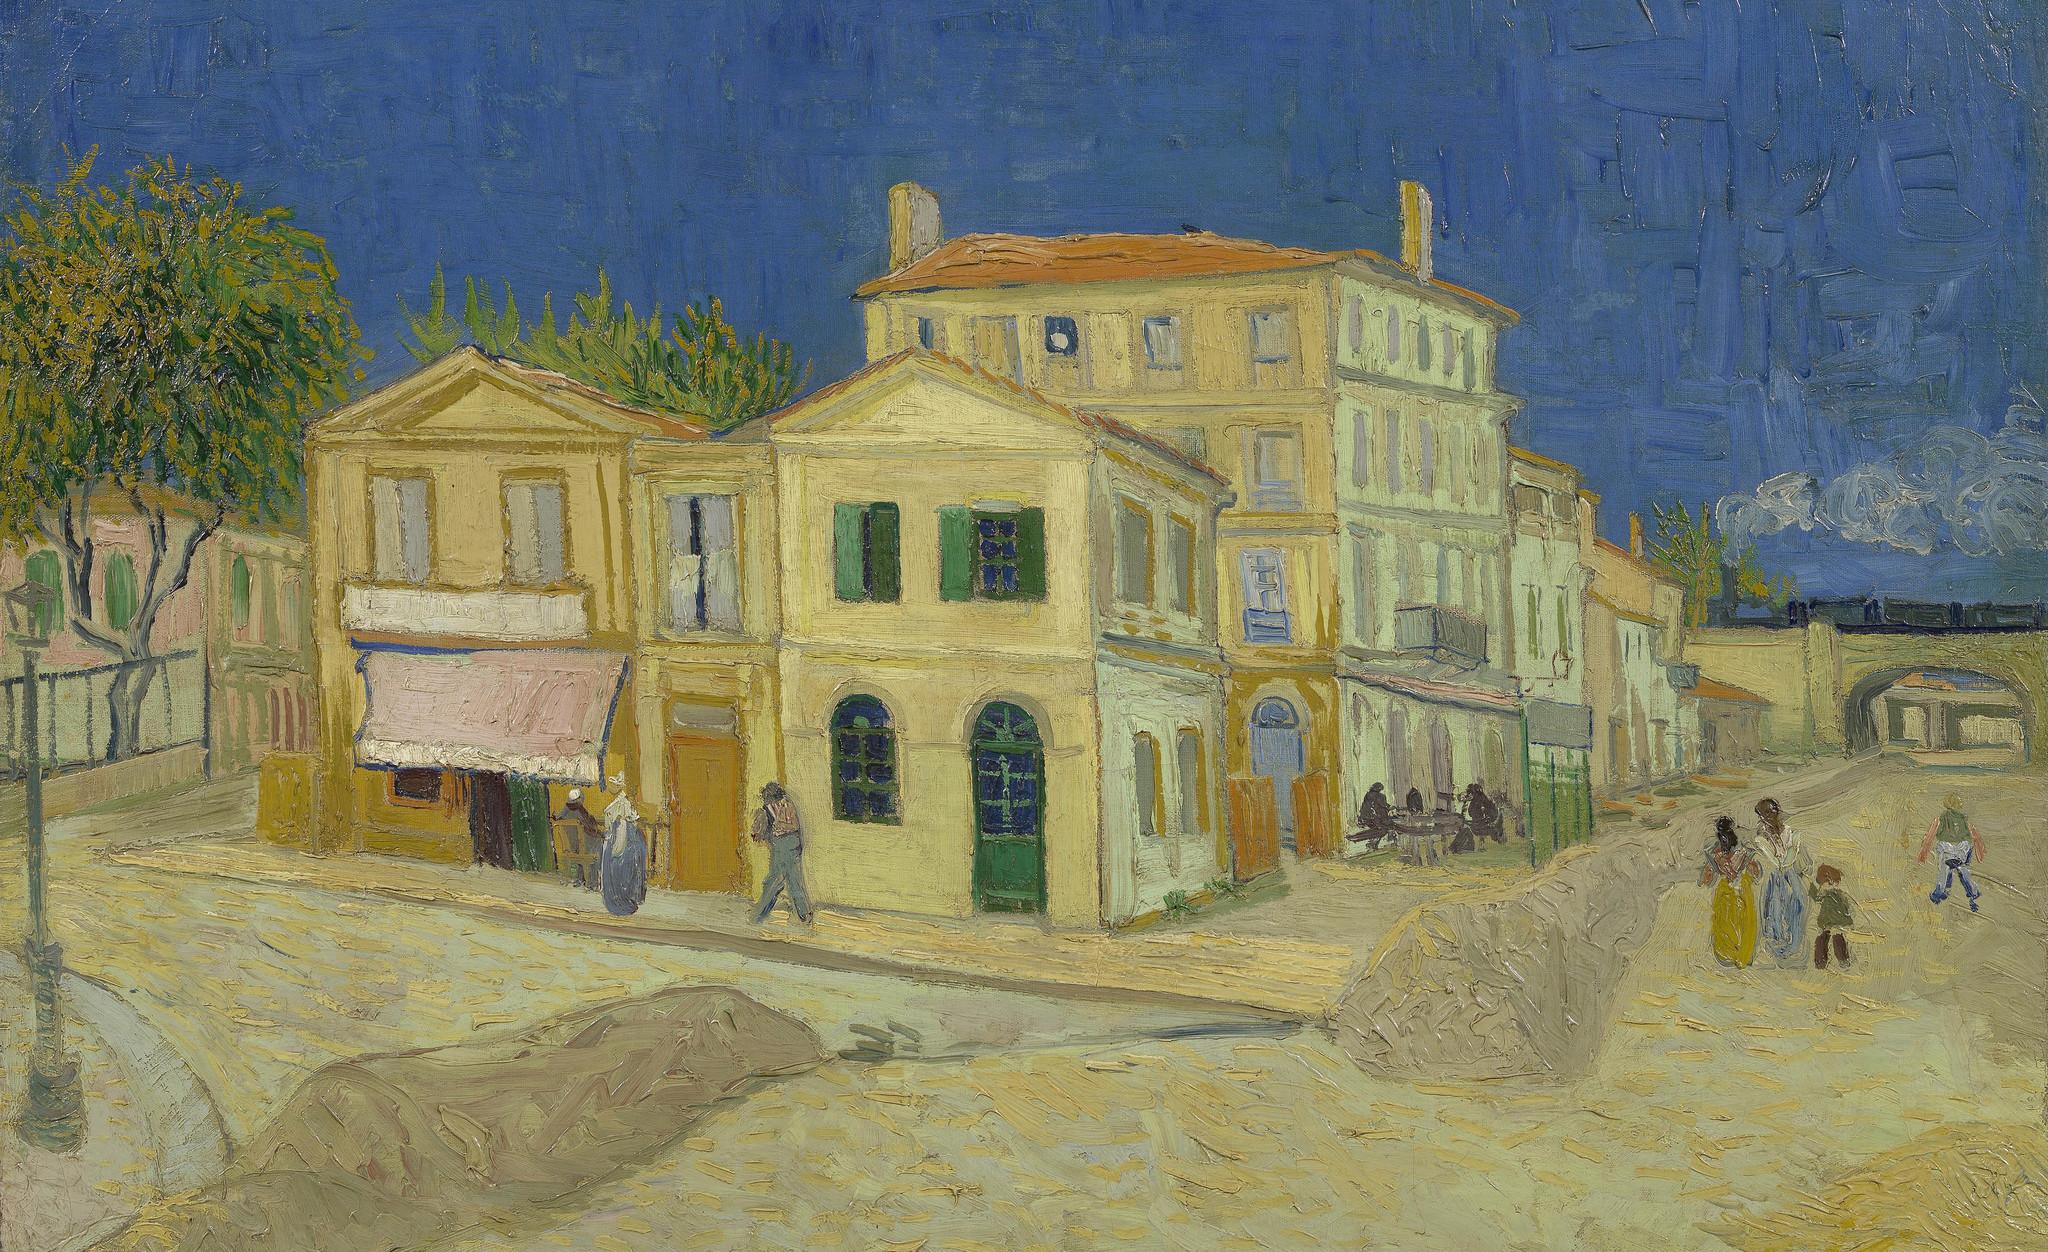 Het gele huis - Van Gogh